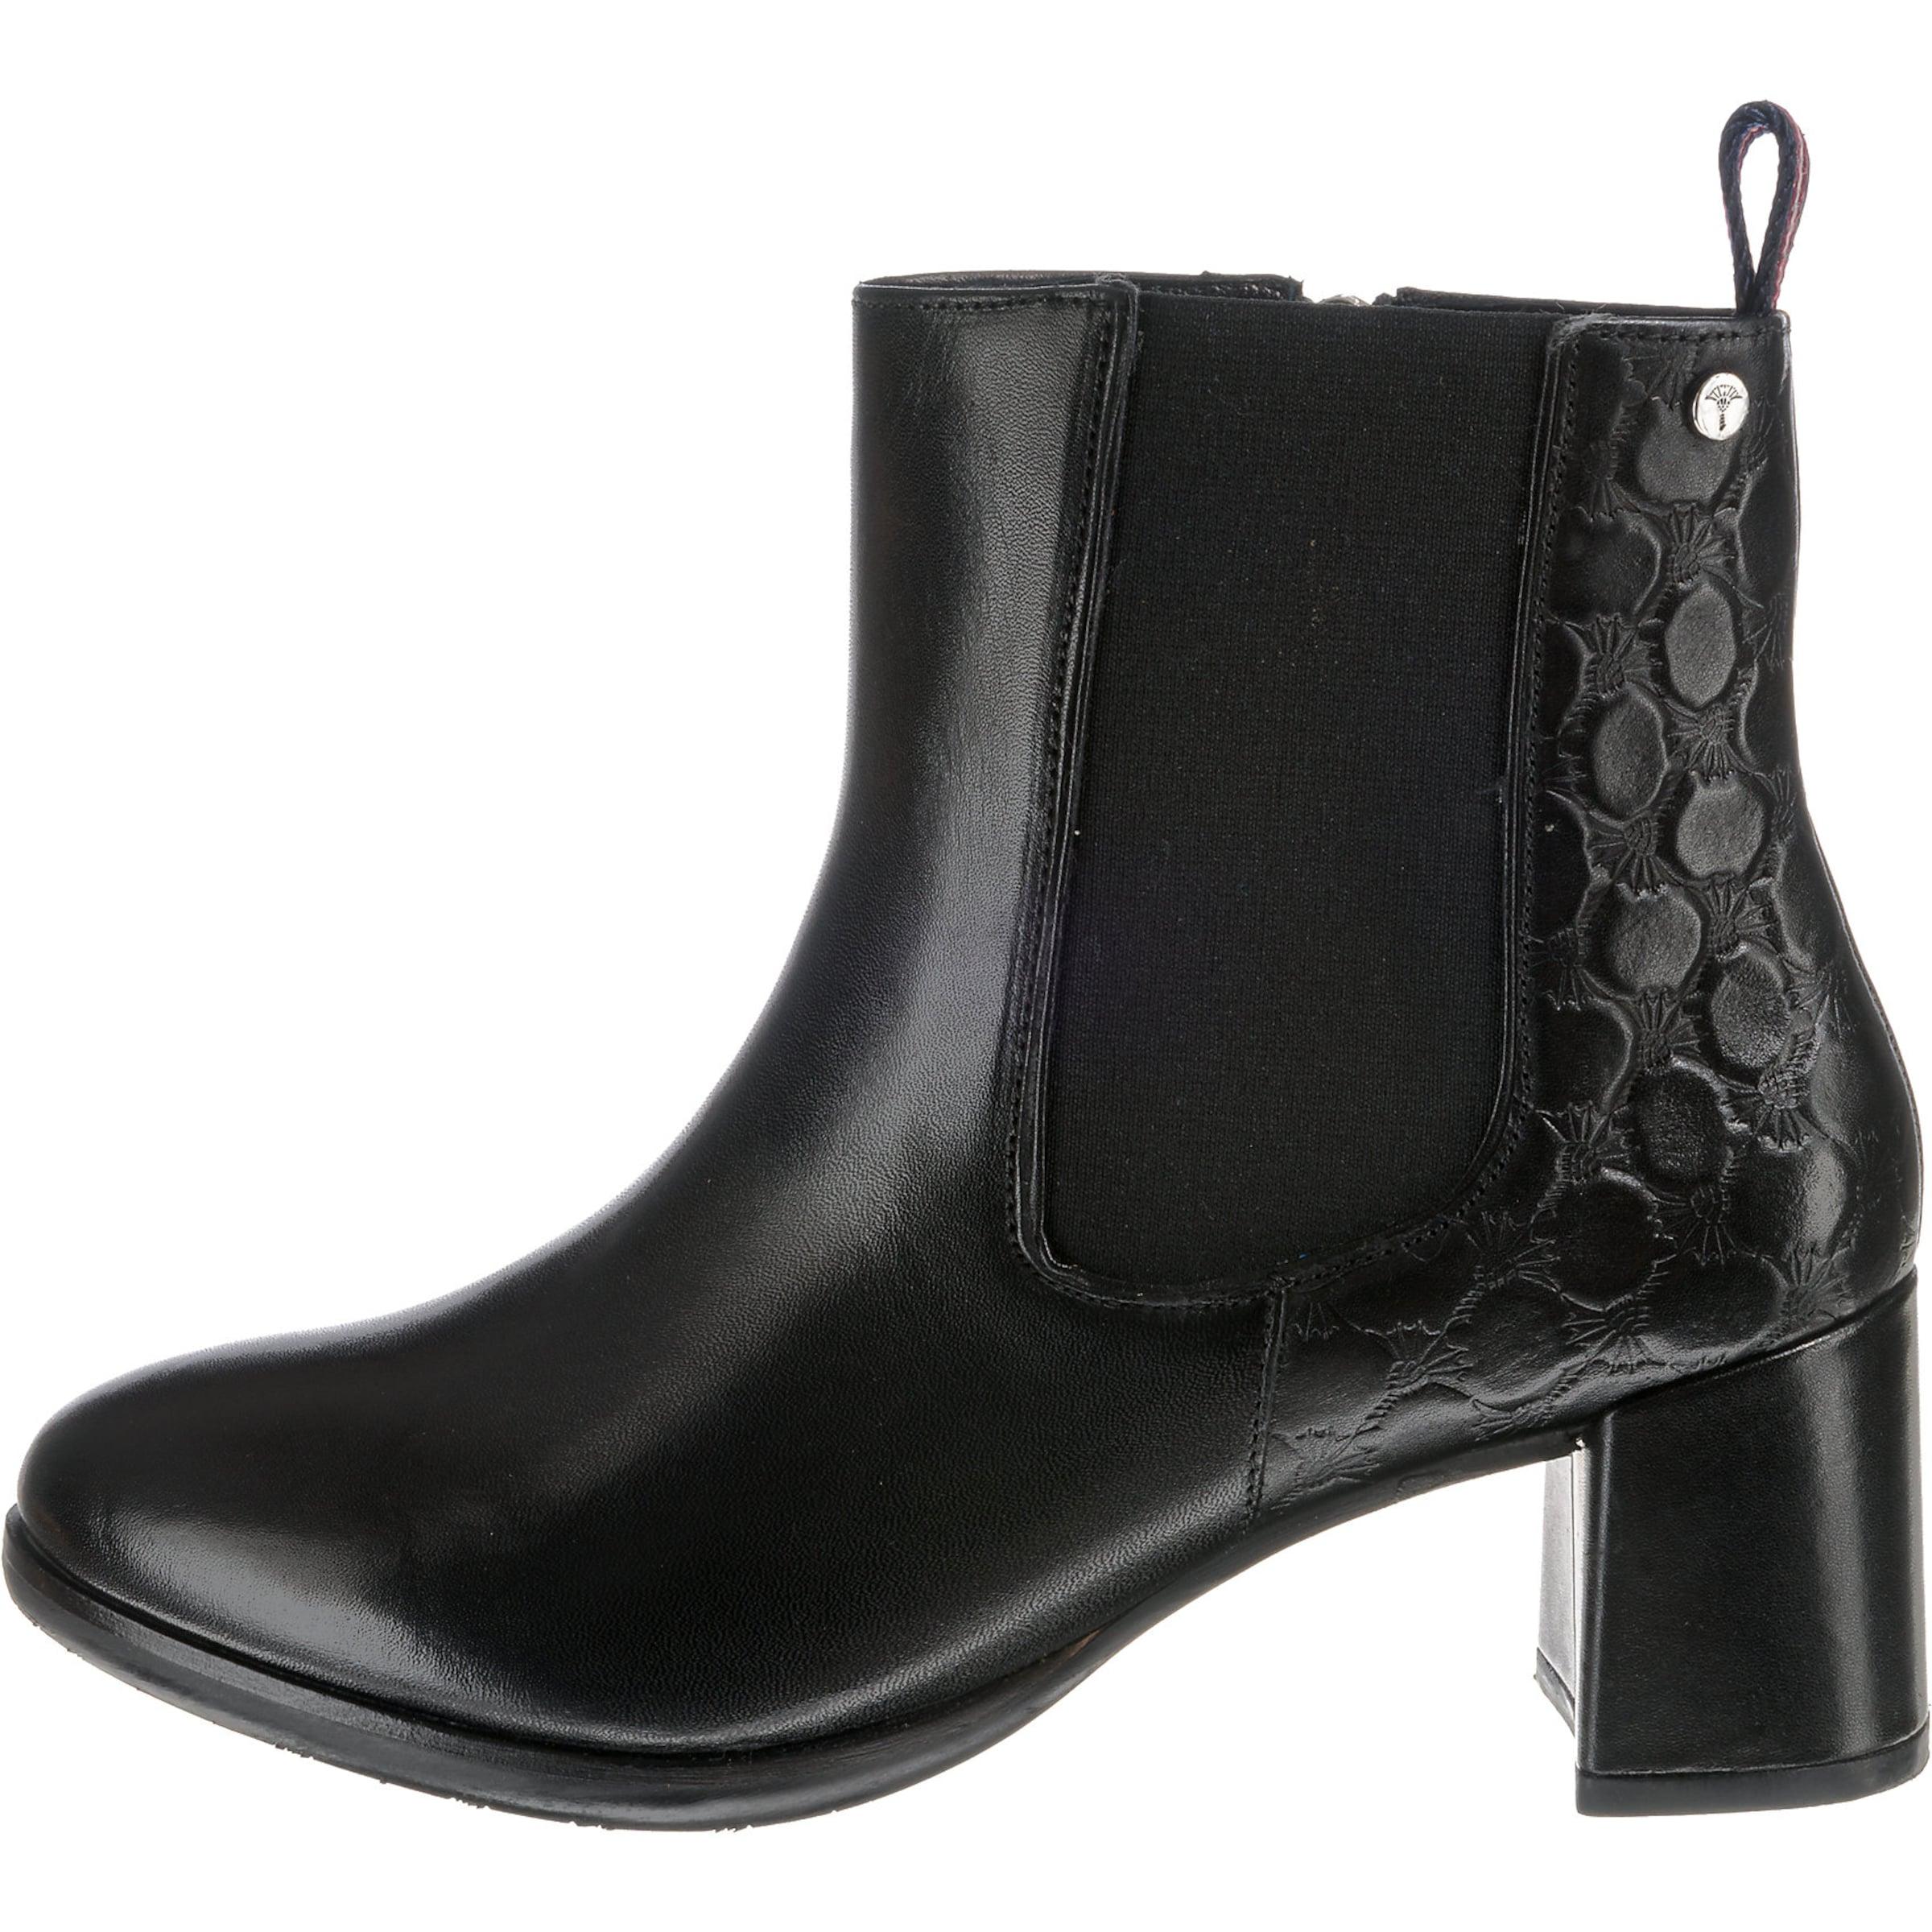 Schwarz In Boots JoopChelsea JoopChelsea JoopChelsea In 'nara' Schwarz Boots 'nara' qzUSpMV